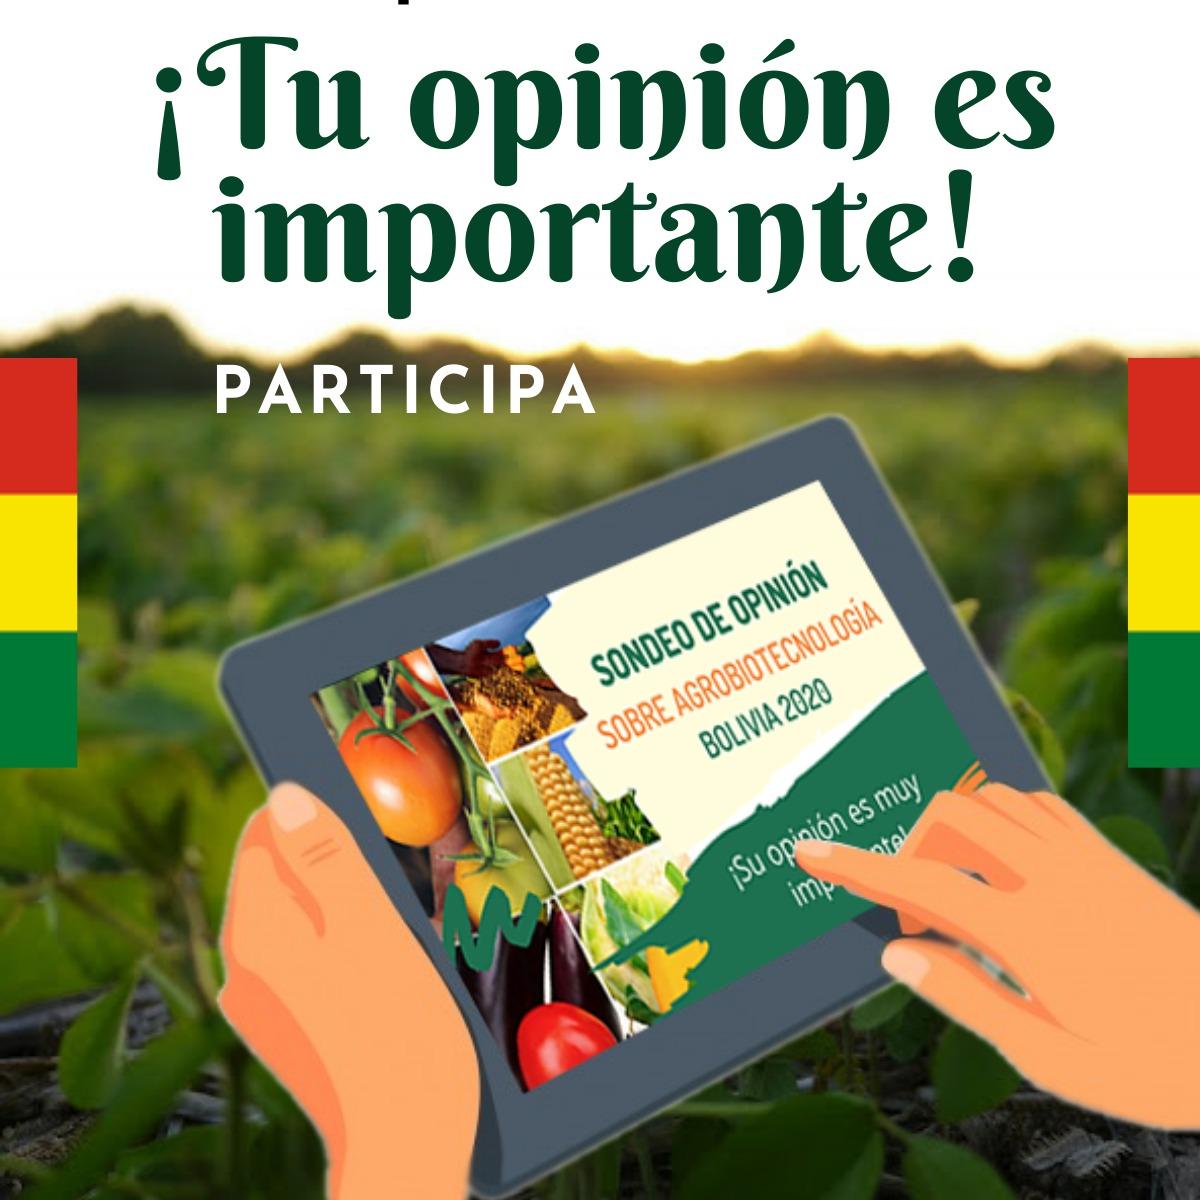 SONDEO DE OPINIÓN SOBRE  AGROBIOTECNOLOGÍA - BOLIVIA 2020